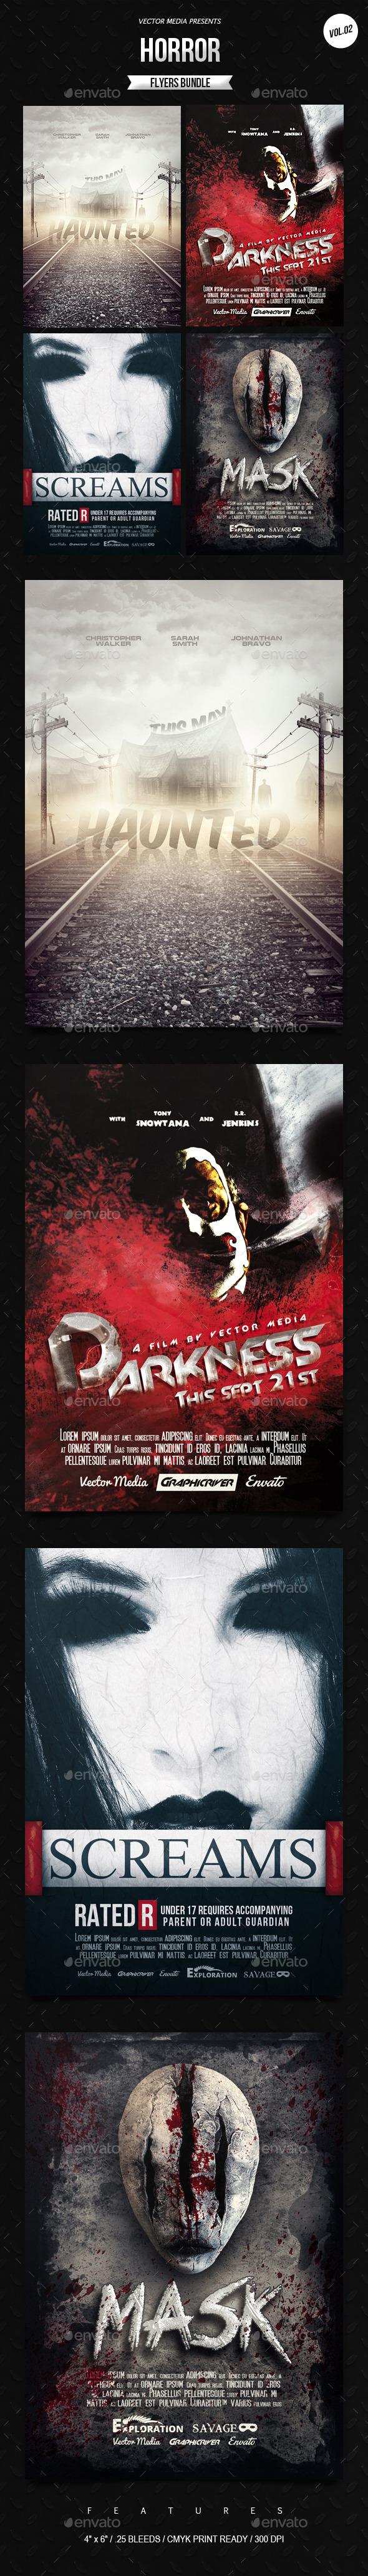 Horror - Movie Posters Bundle [Vol.02] - Miscellaneous Events